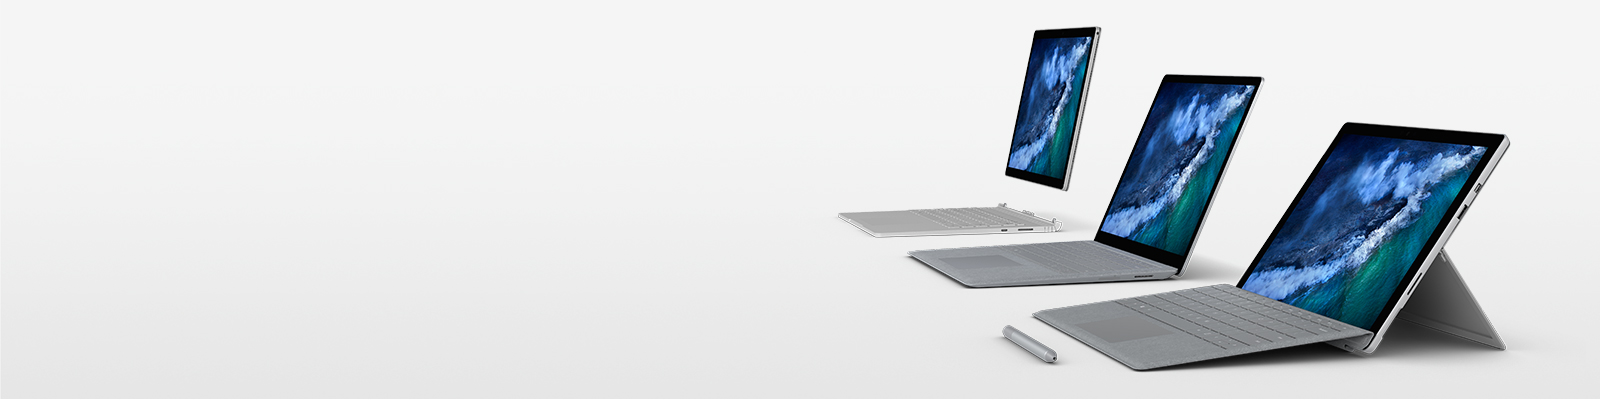 Surface Pro, Surface Laptop e Surface Book 2 com Caneta para Surface